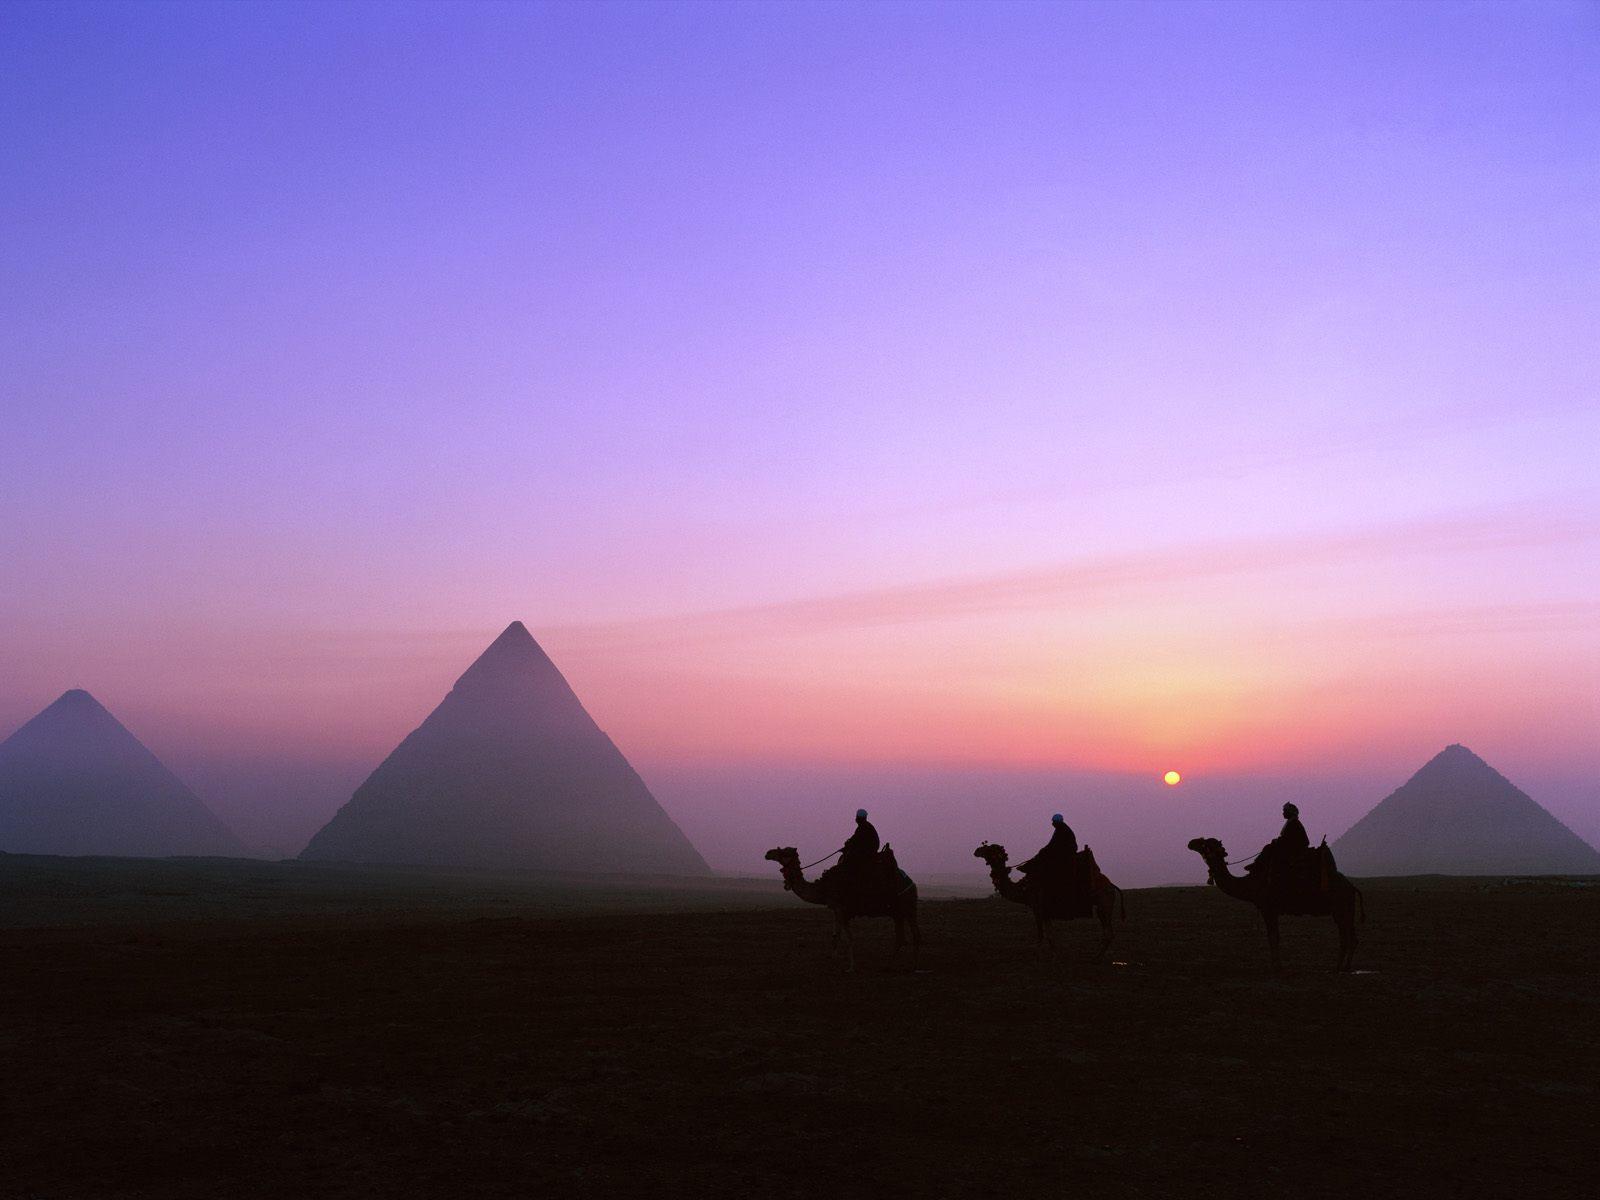 mystic-journey-pyramids-giza-egypt-1-1600x1200.jpg